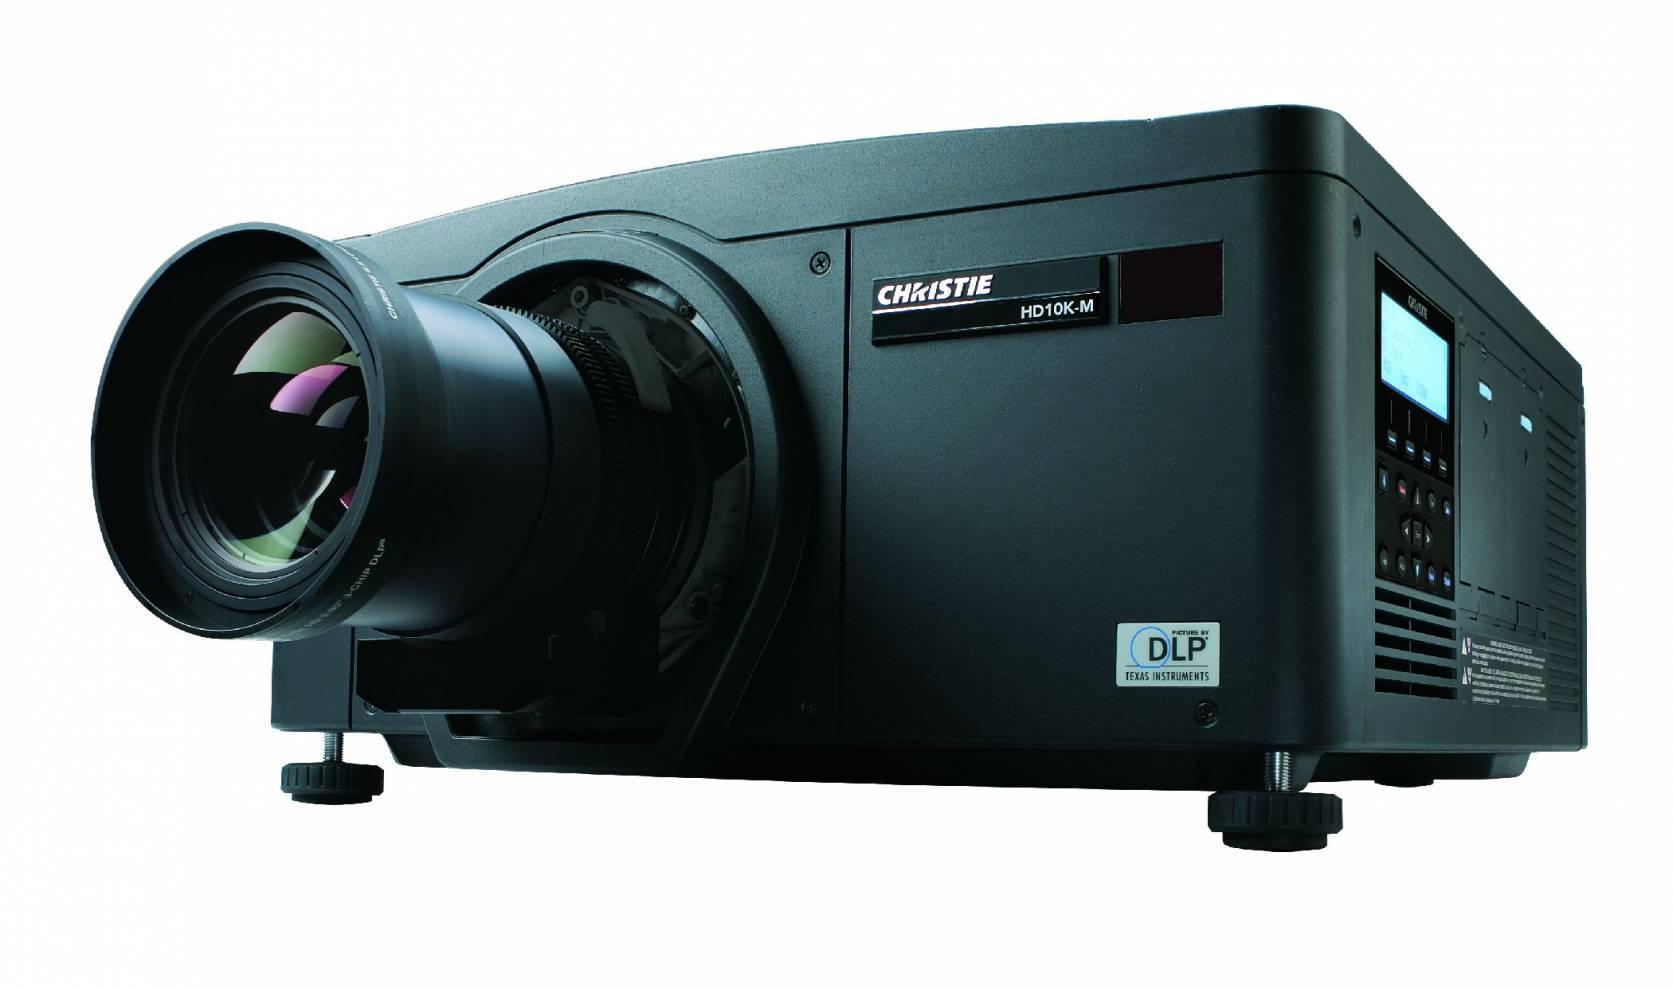 Christie HD10K-M Projector